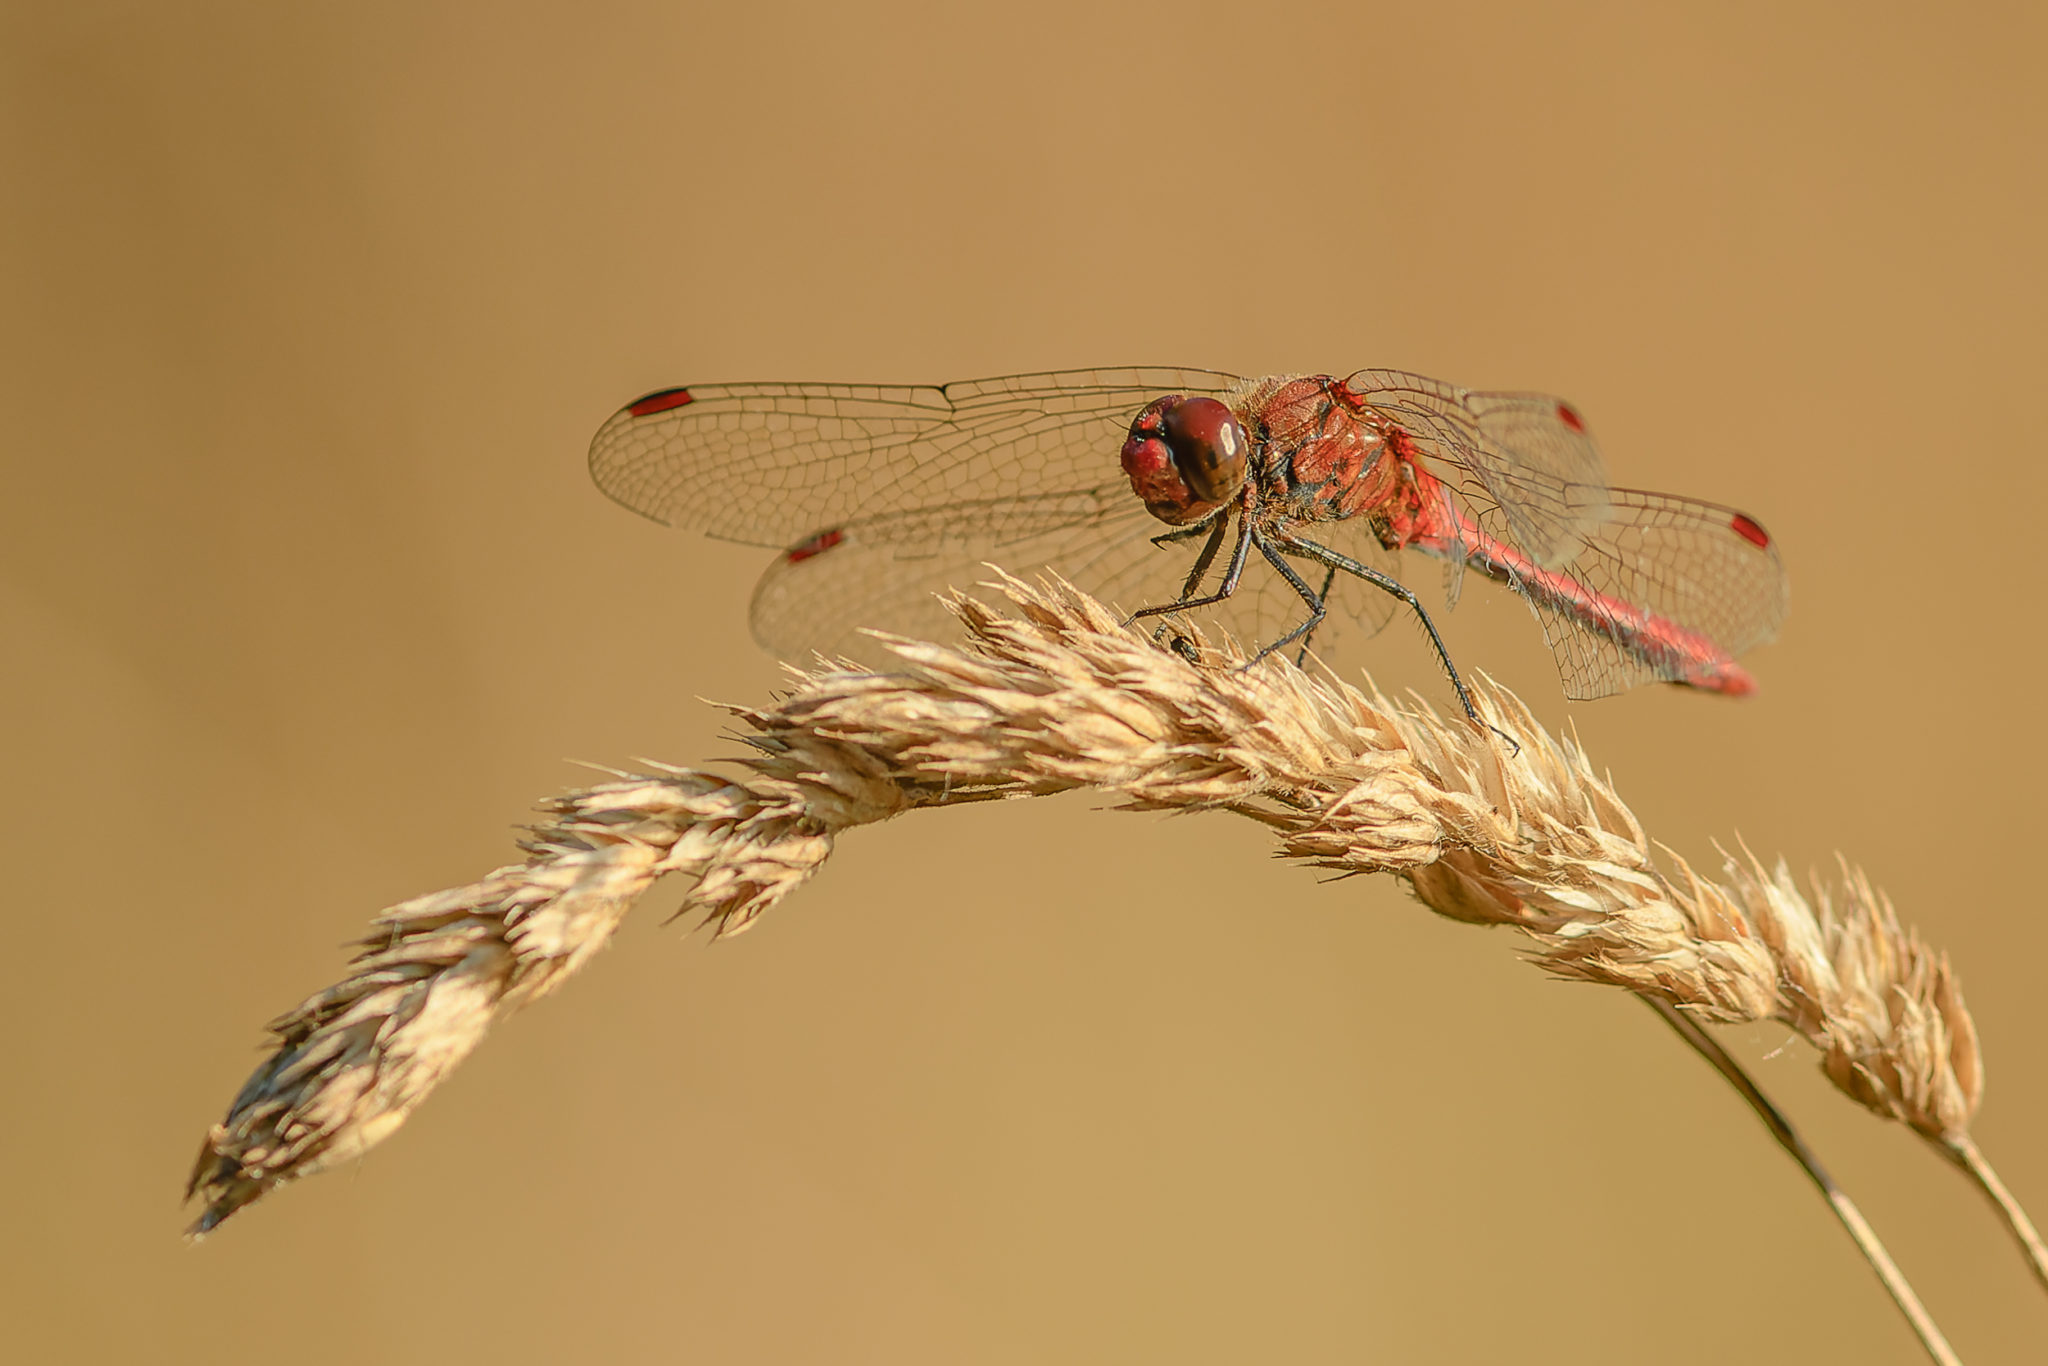 Blutrote Heidelibelle (Sympetrum sanguineum), Naturfotografie Olaf & Sylvia Rentzsch